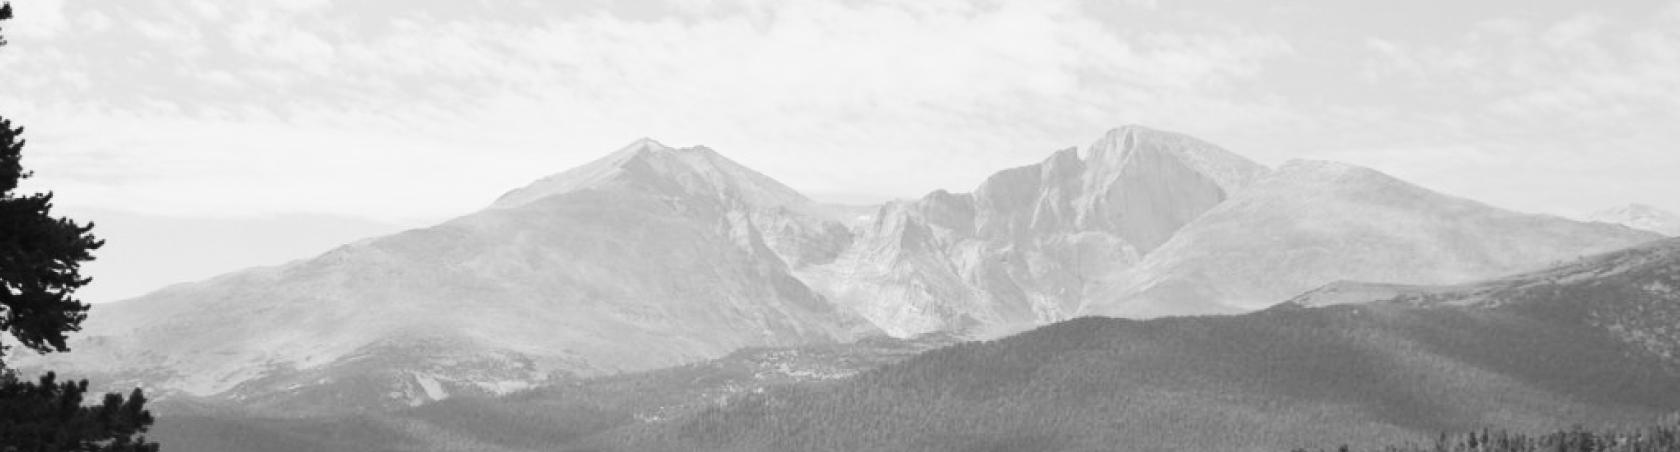 Background Image Mountains